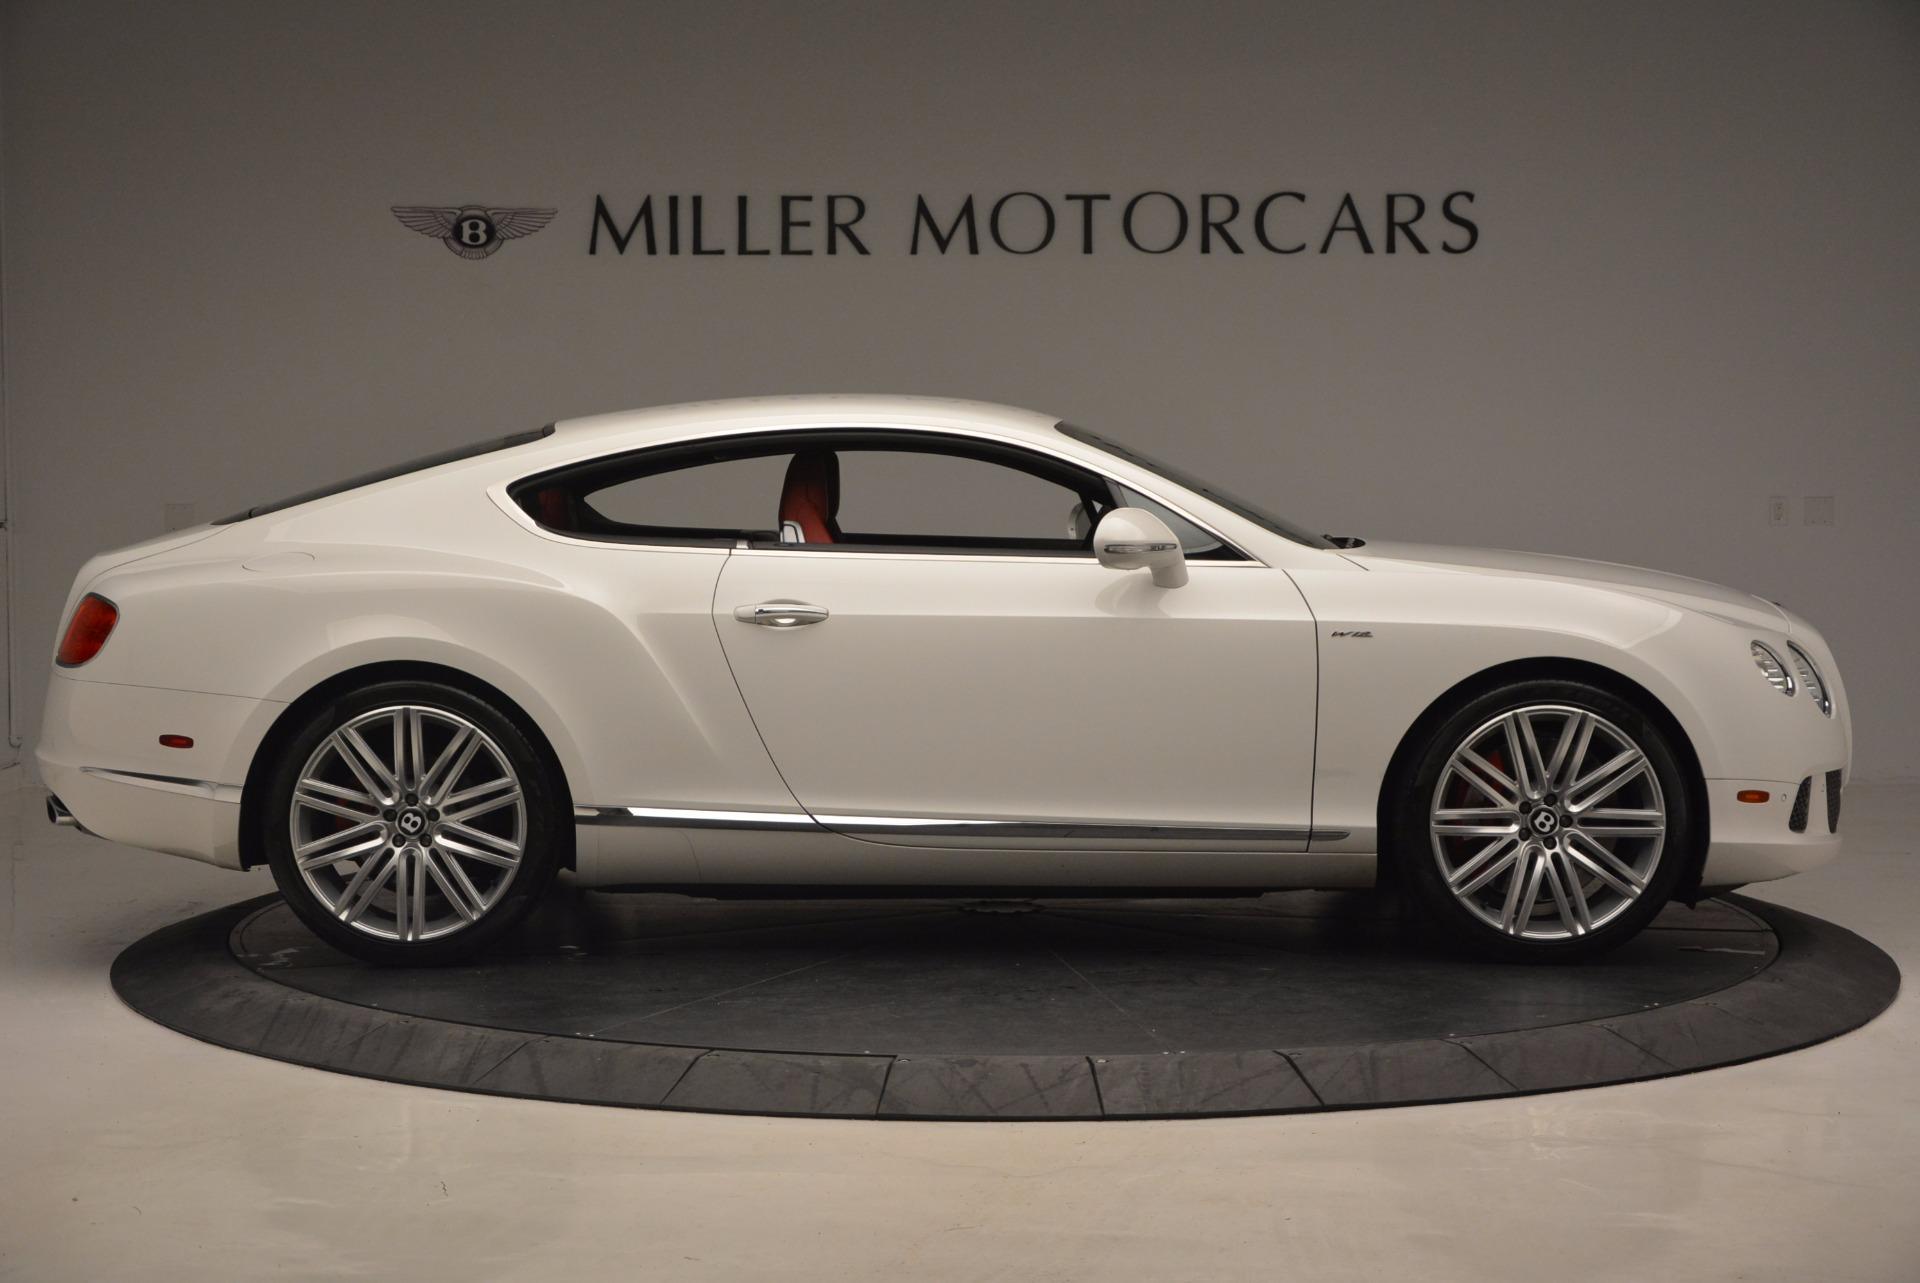 Used 2014 Bentley Continental GT Speed For Sale In Westport, CT 1102_p10